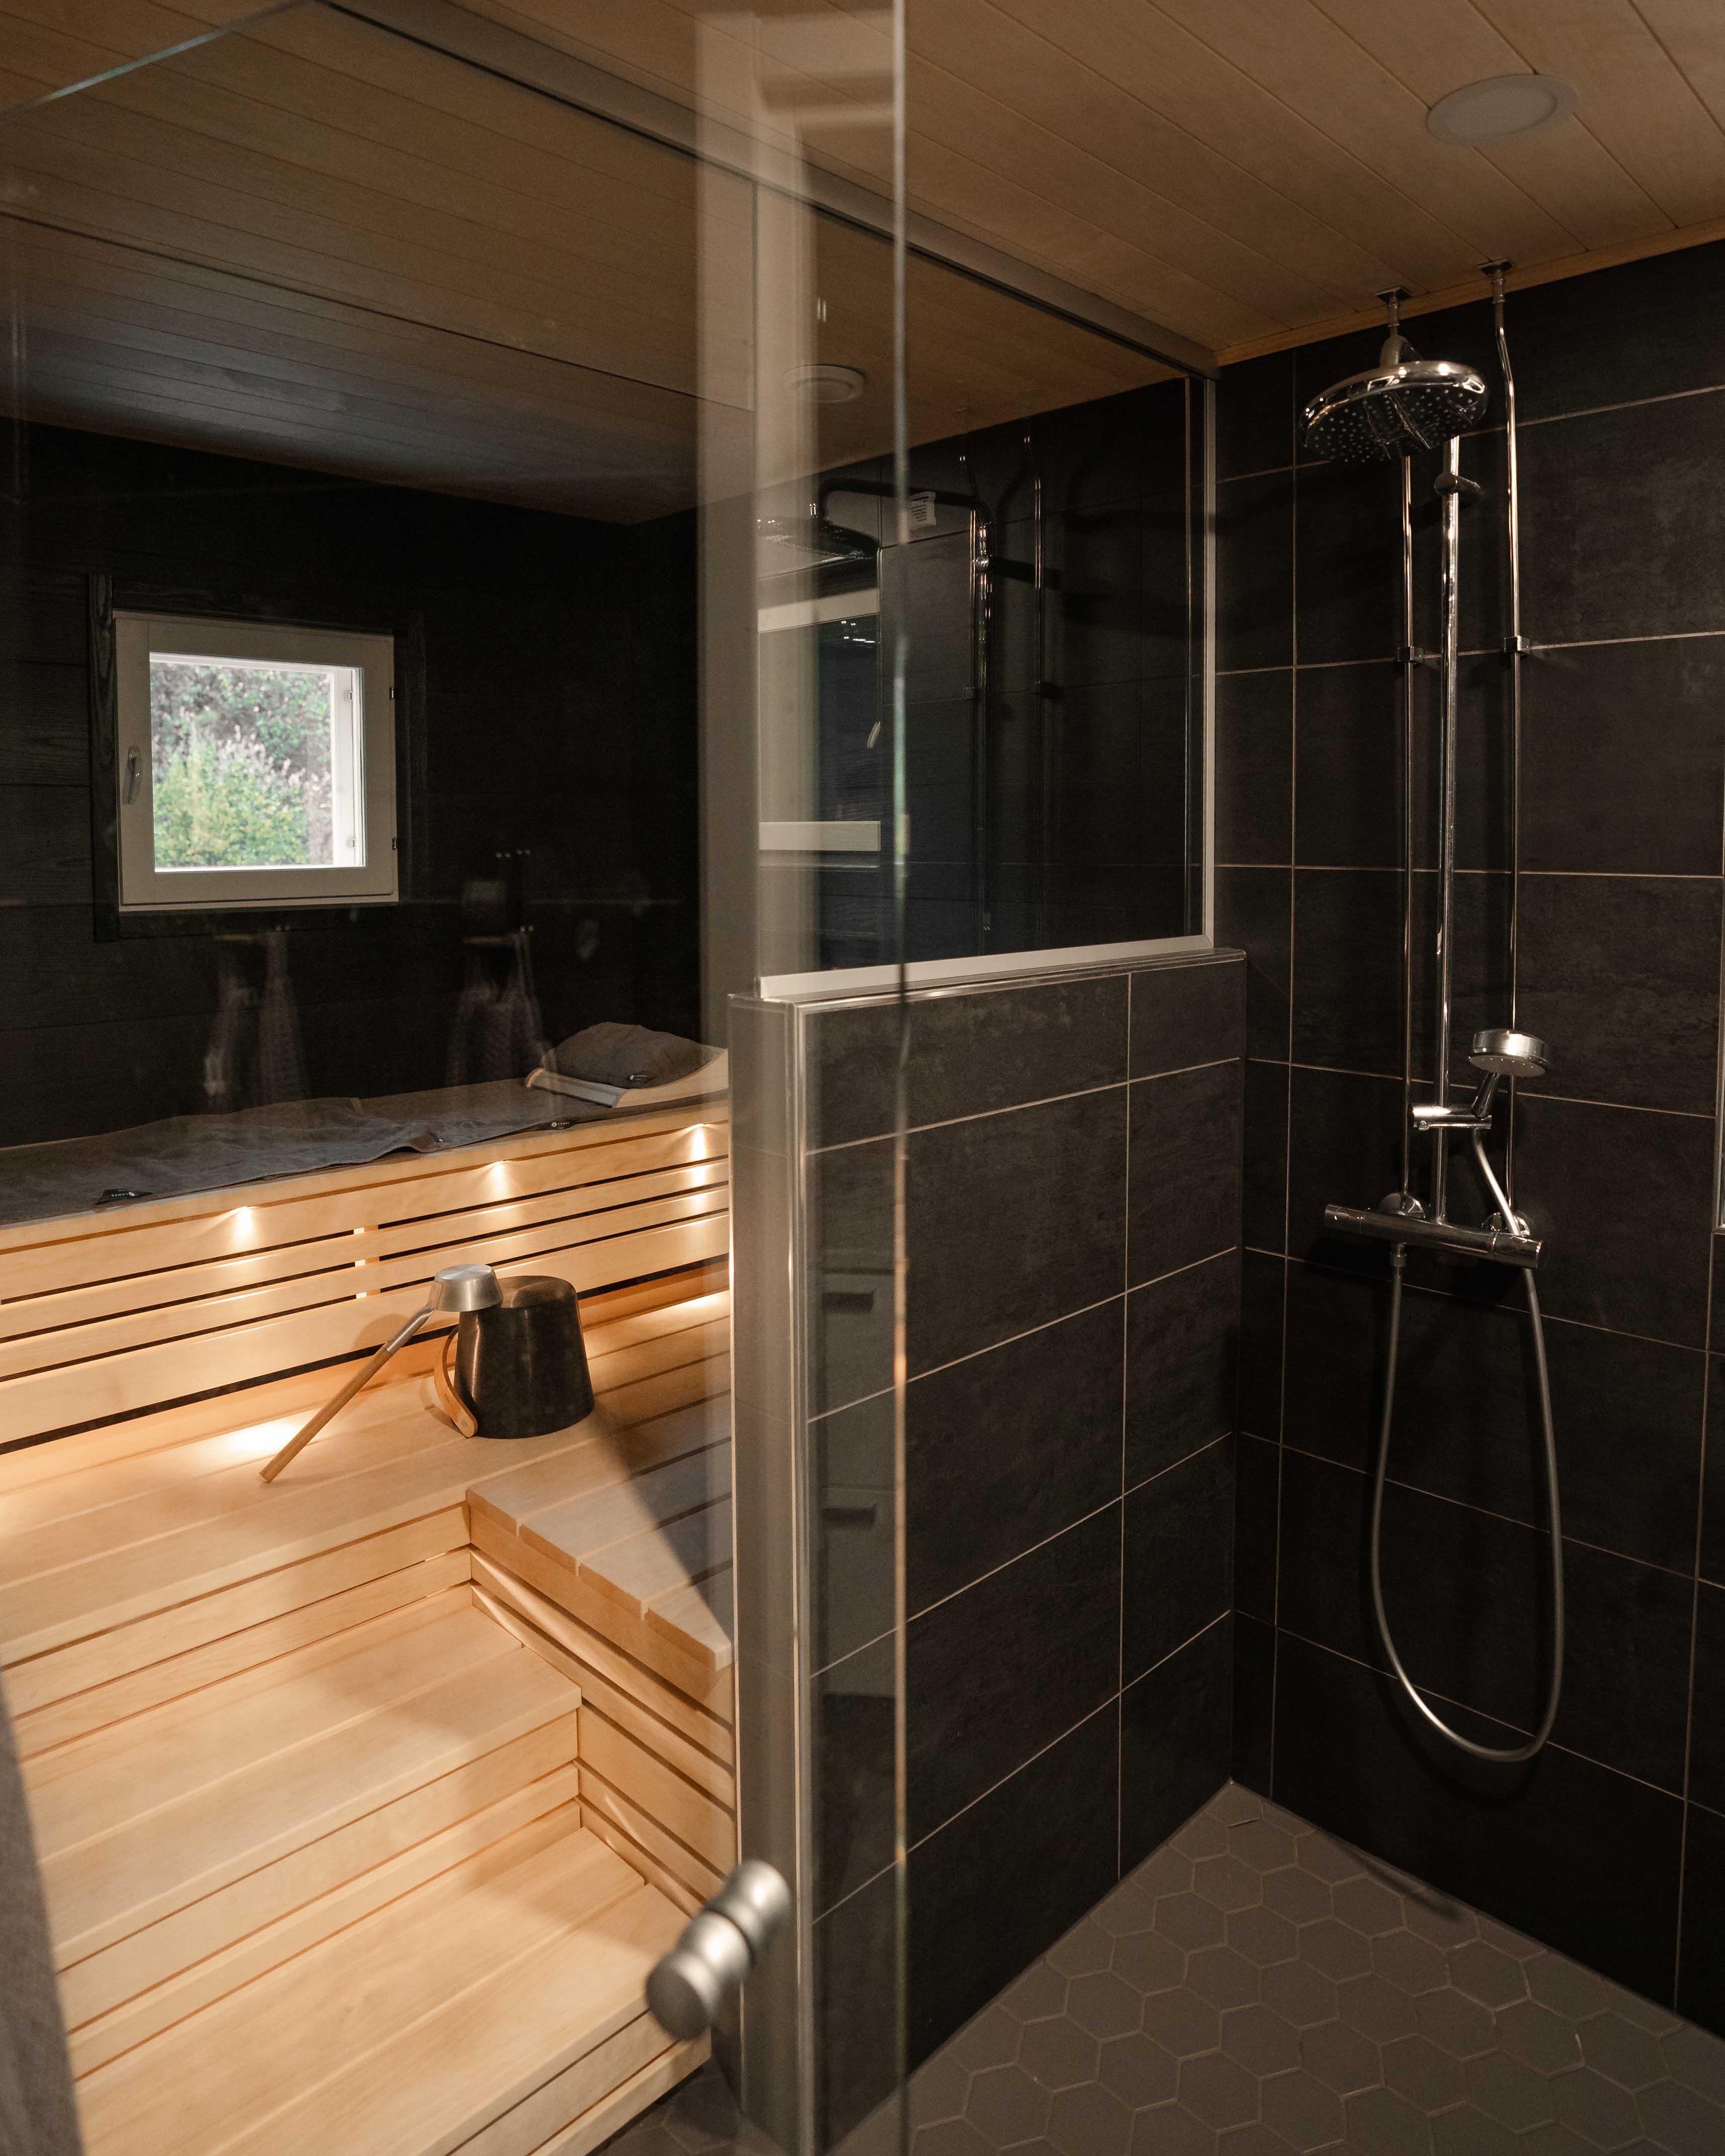 Mittatilaus sauna